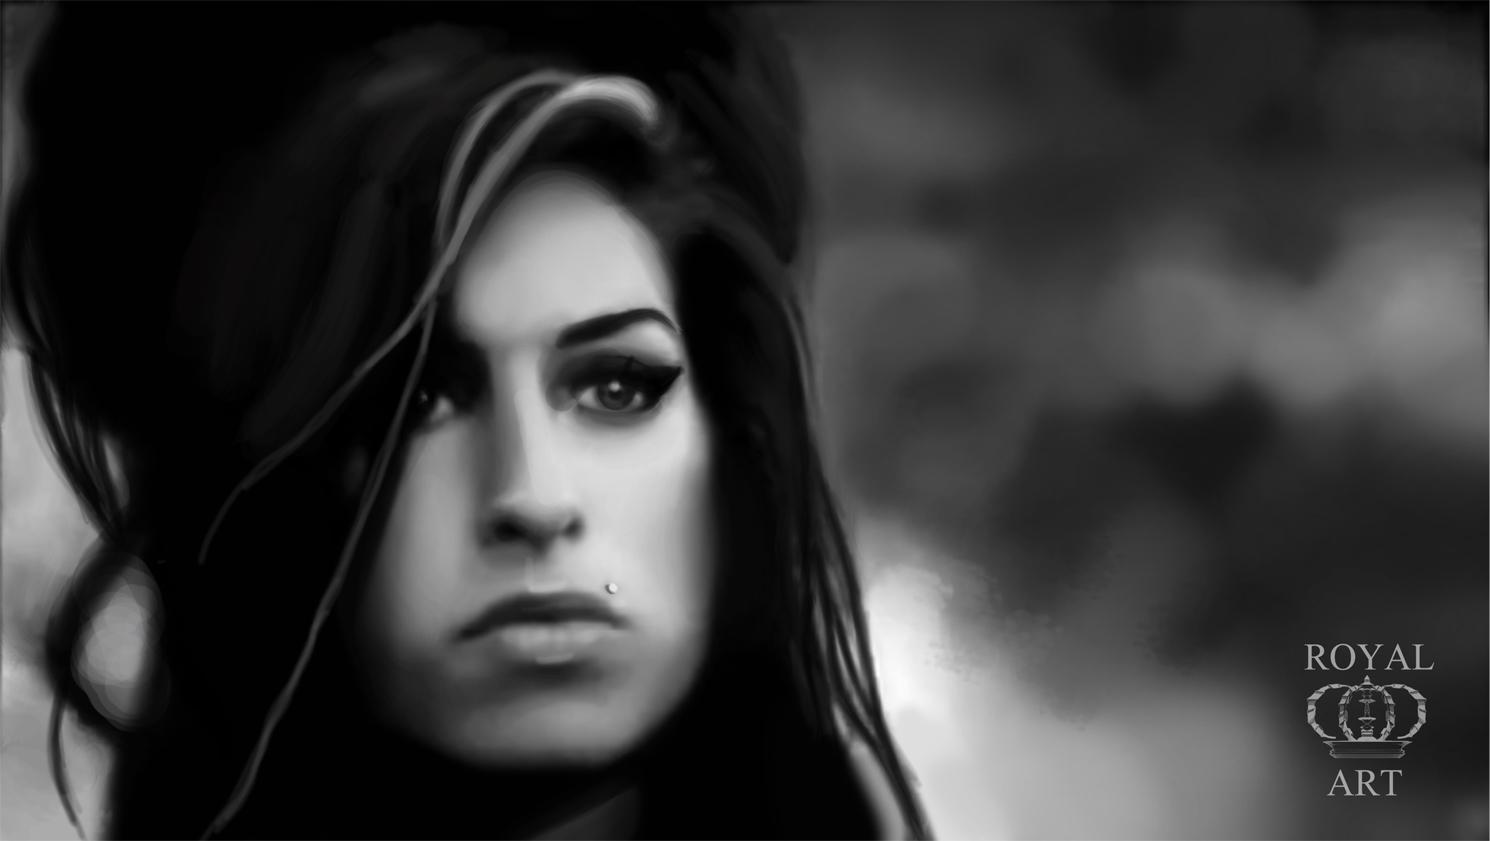 Amy Winehouse Wallpaper 1490x841 Download Hd Wallpaper Wallpapertip